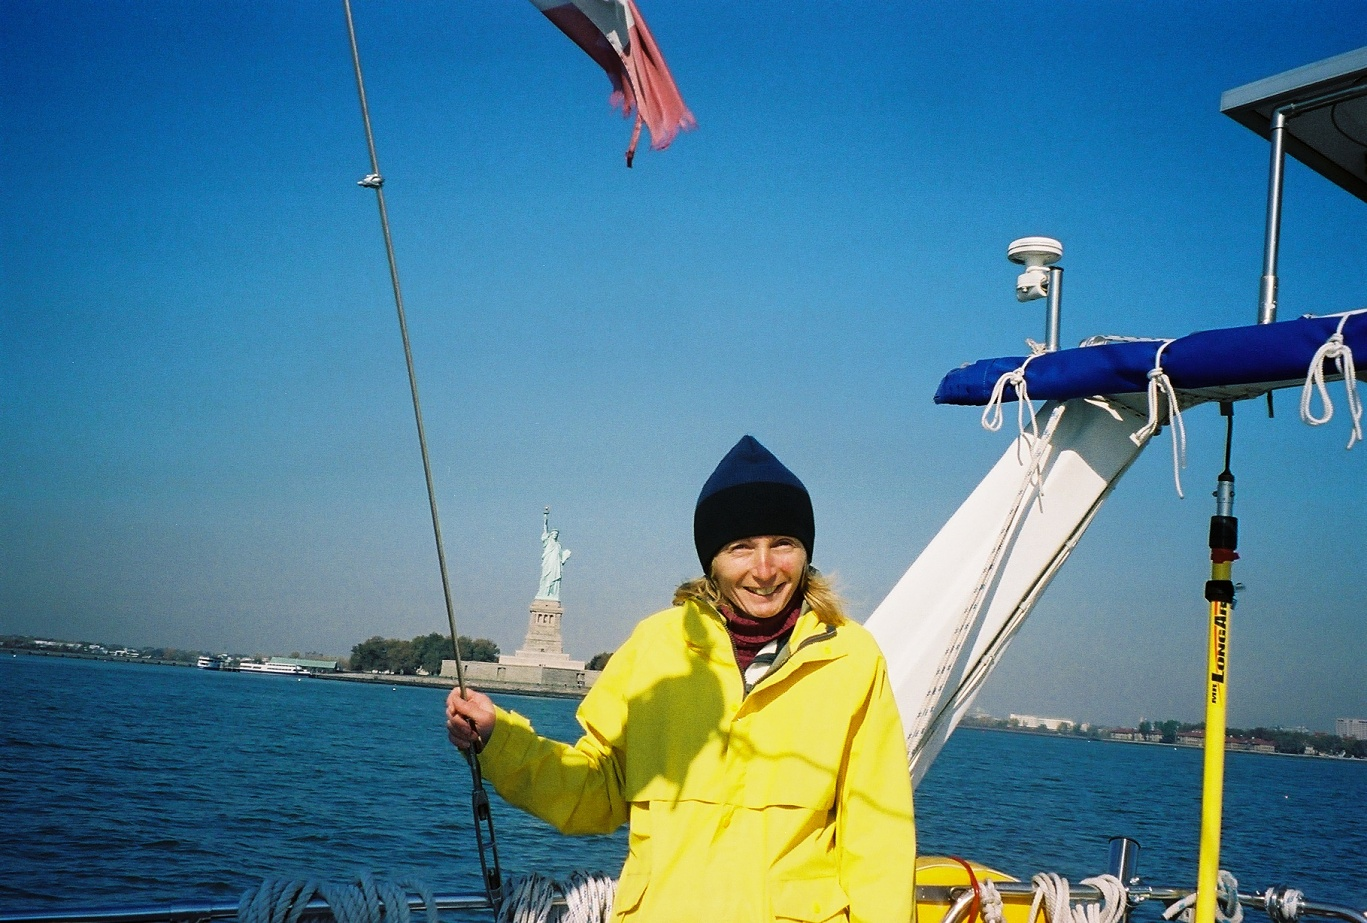 Click image for larger version  Name:Staten Island, NY November 5, 2007.jpg Views:101 Size:502.2 KB ID:9453